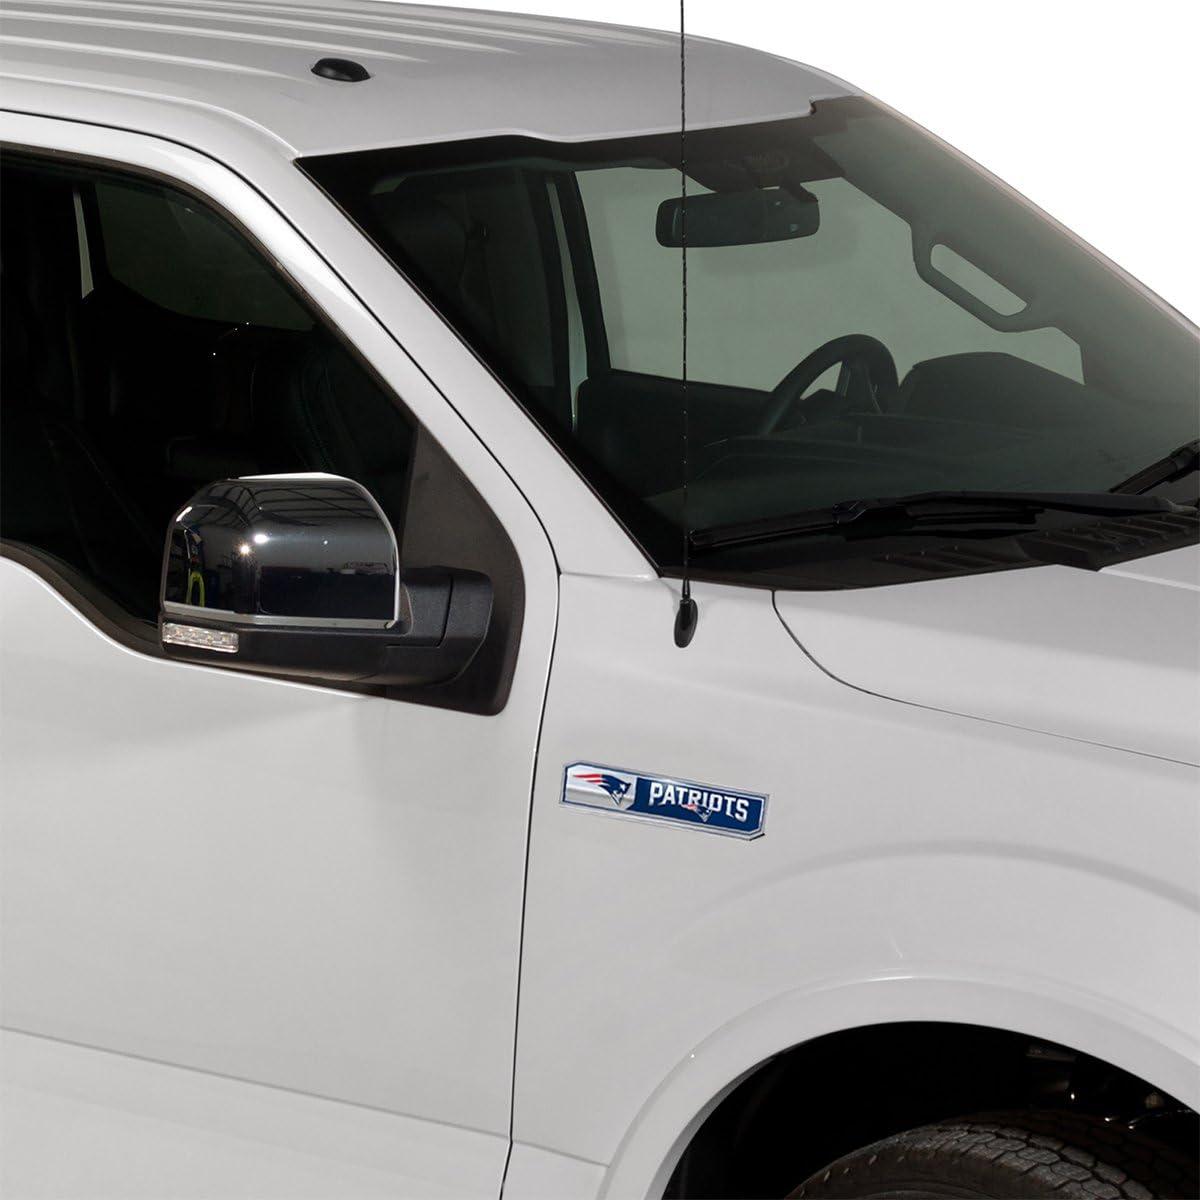 FANMATS Denver Broncos Truck Emblems